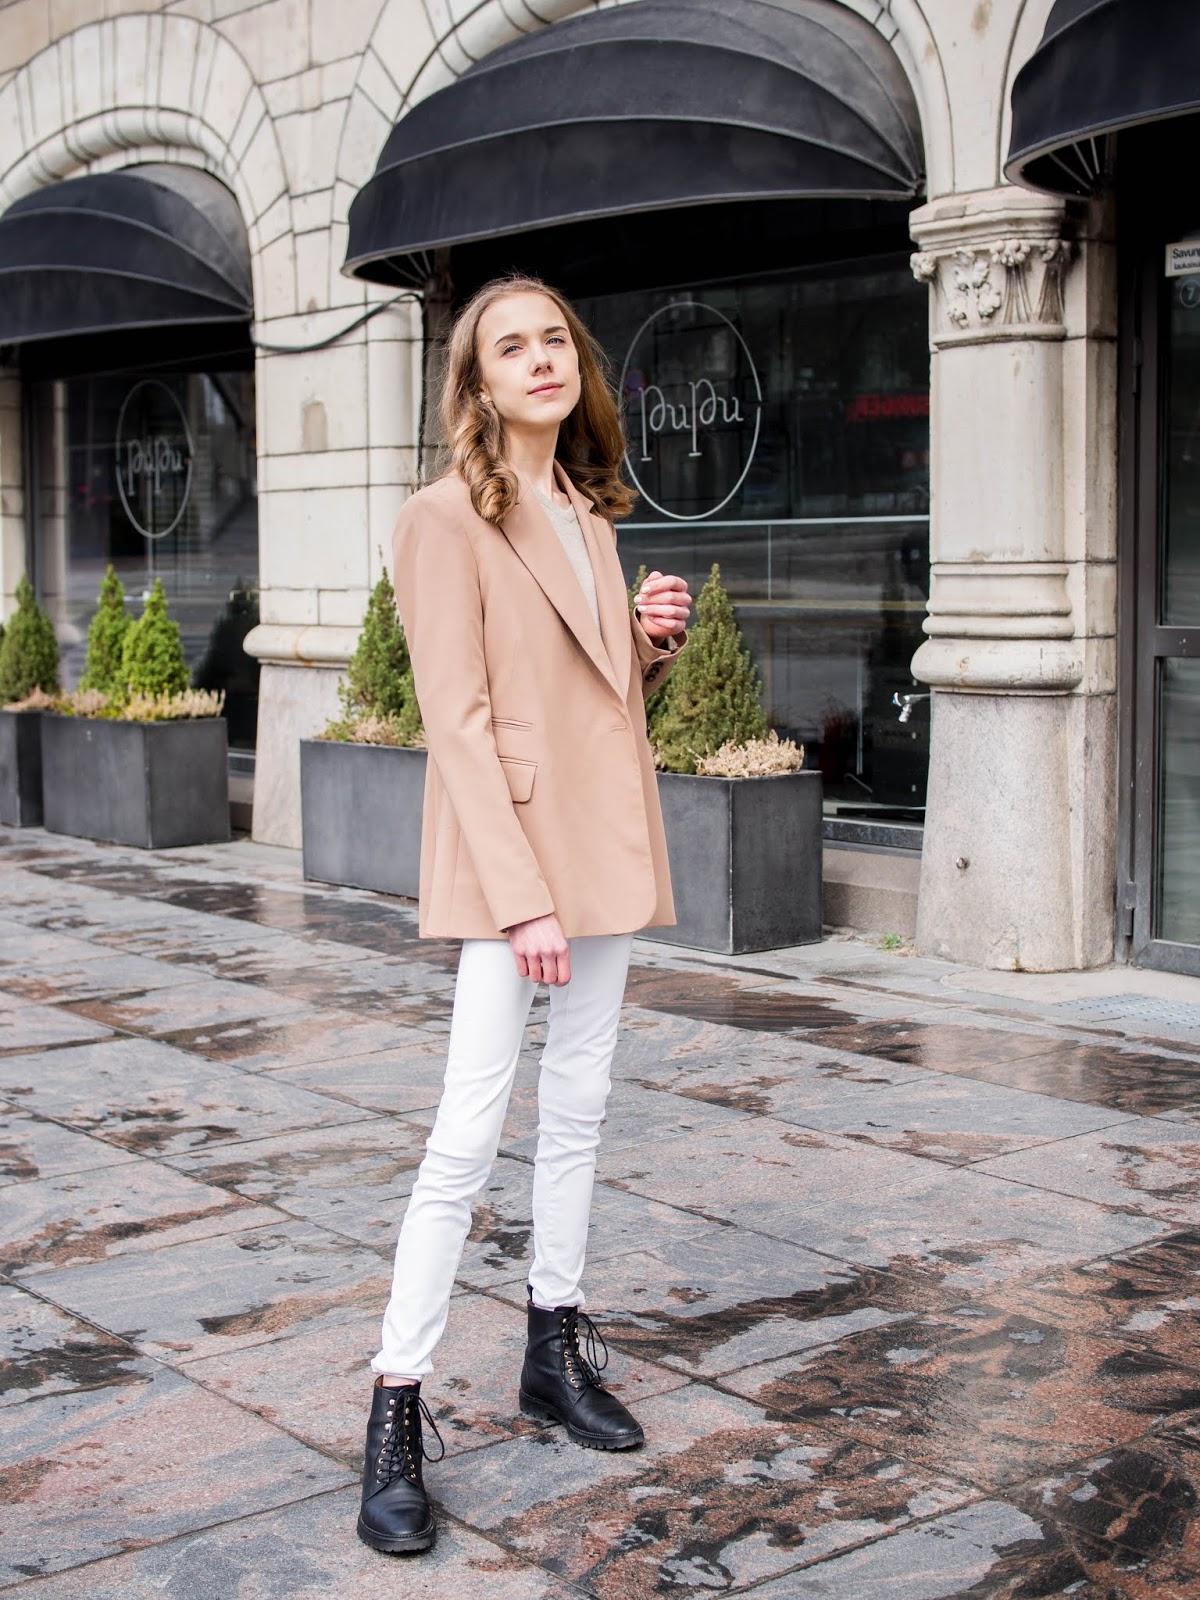 Coronavirus, fashion and spring outfit inspiration - Koronavirus, muotimaailma ja kevätasu